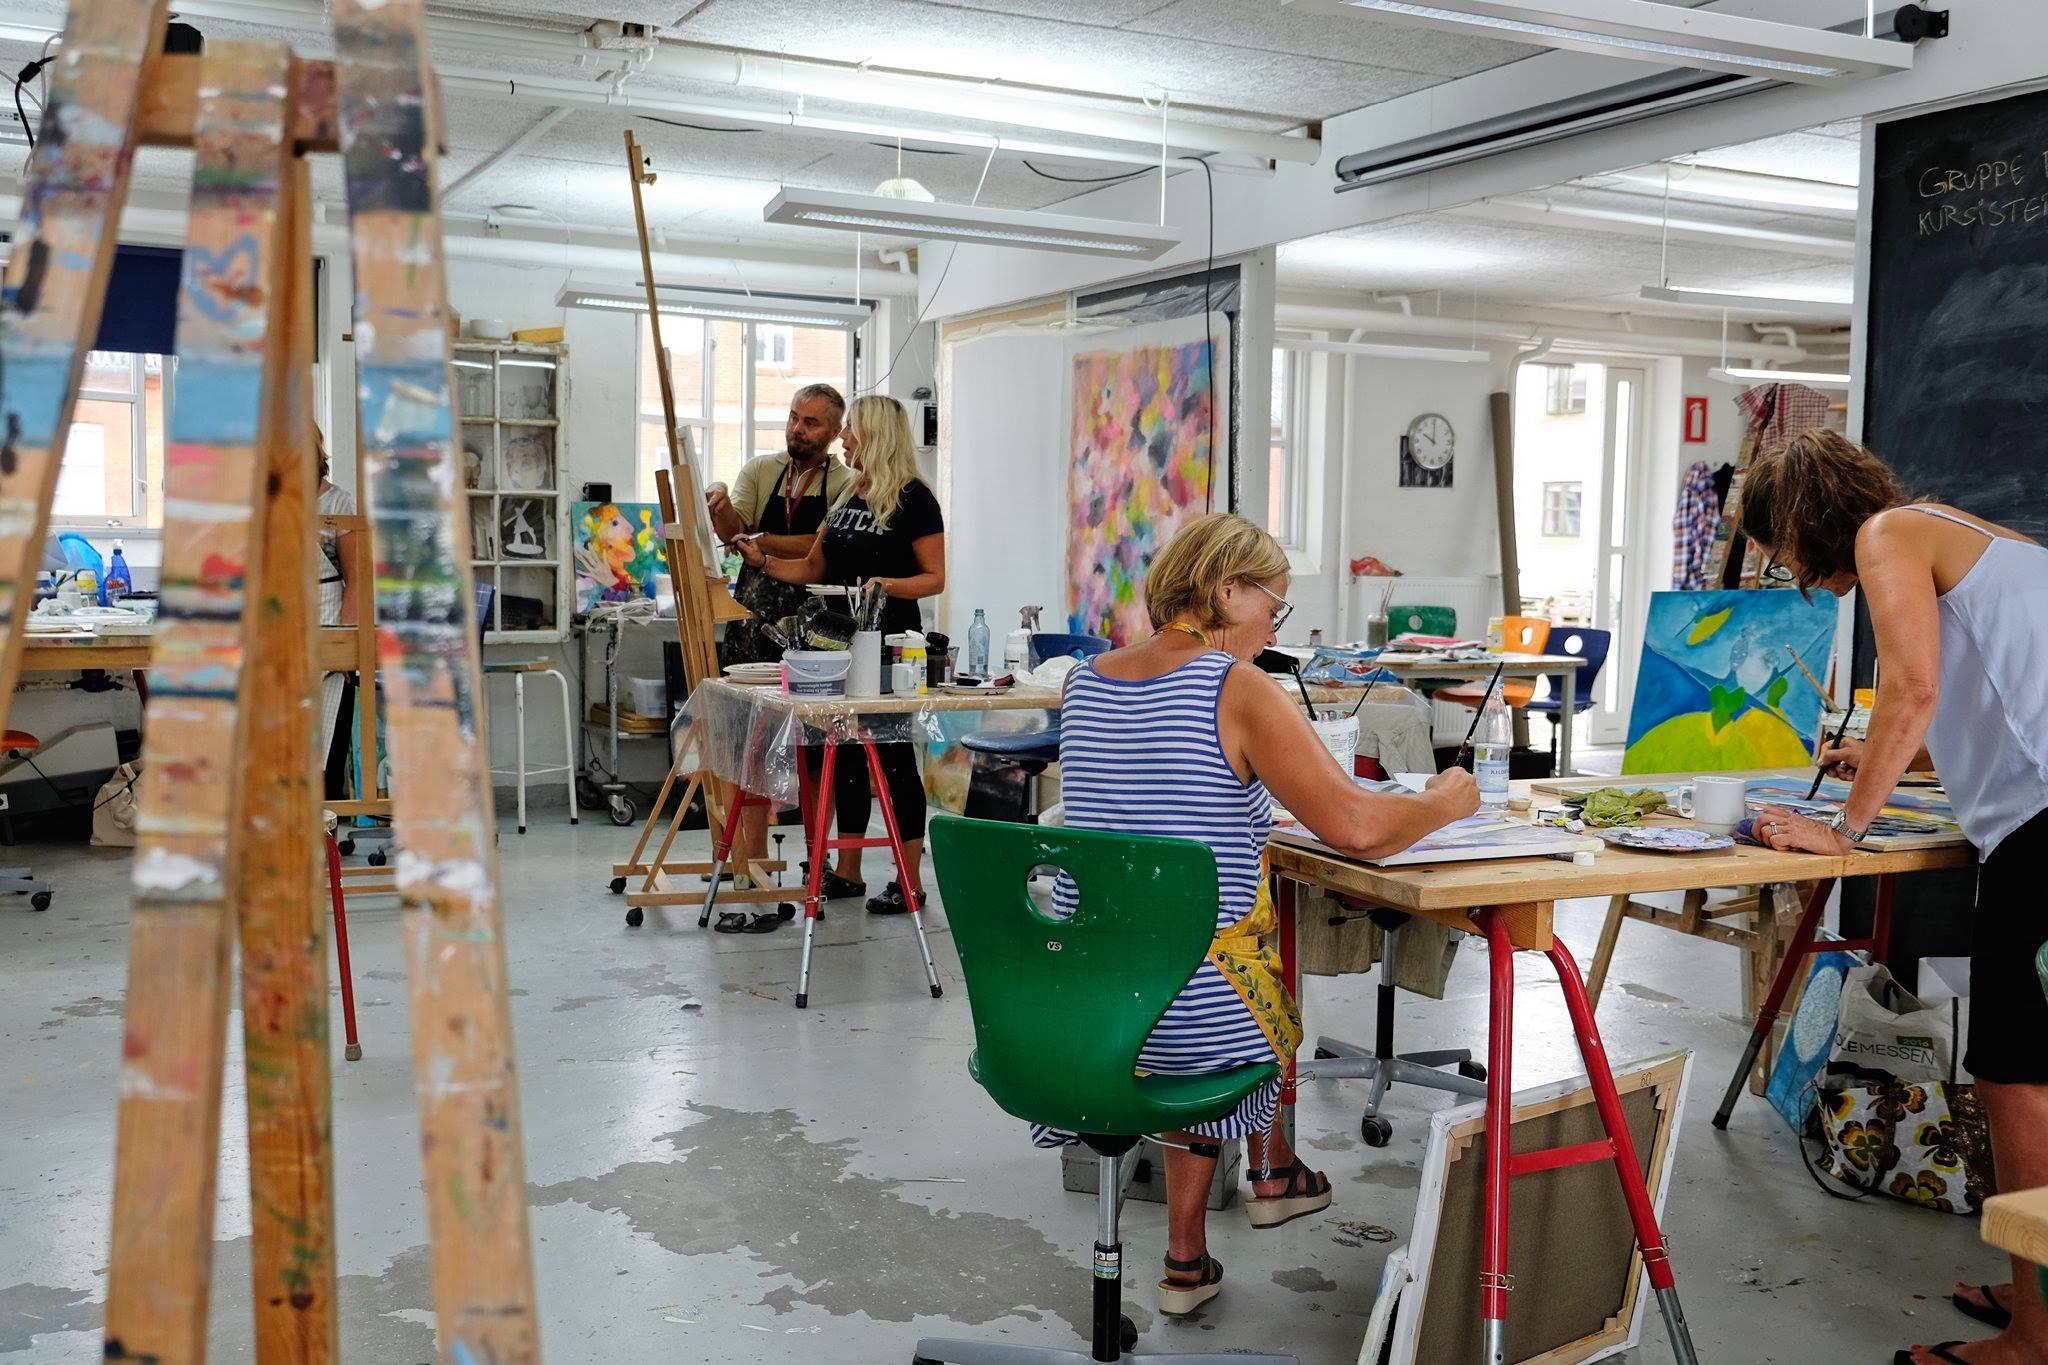 Kunst - Maleri - Olie - Akryl - Drama - Stemning